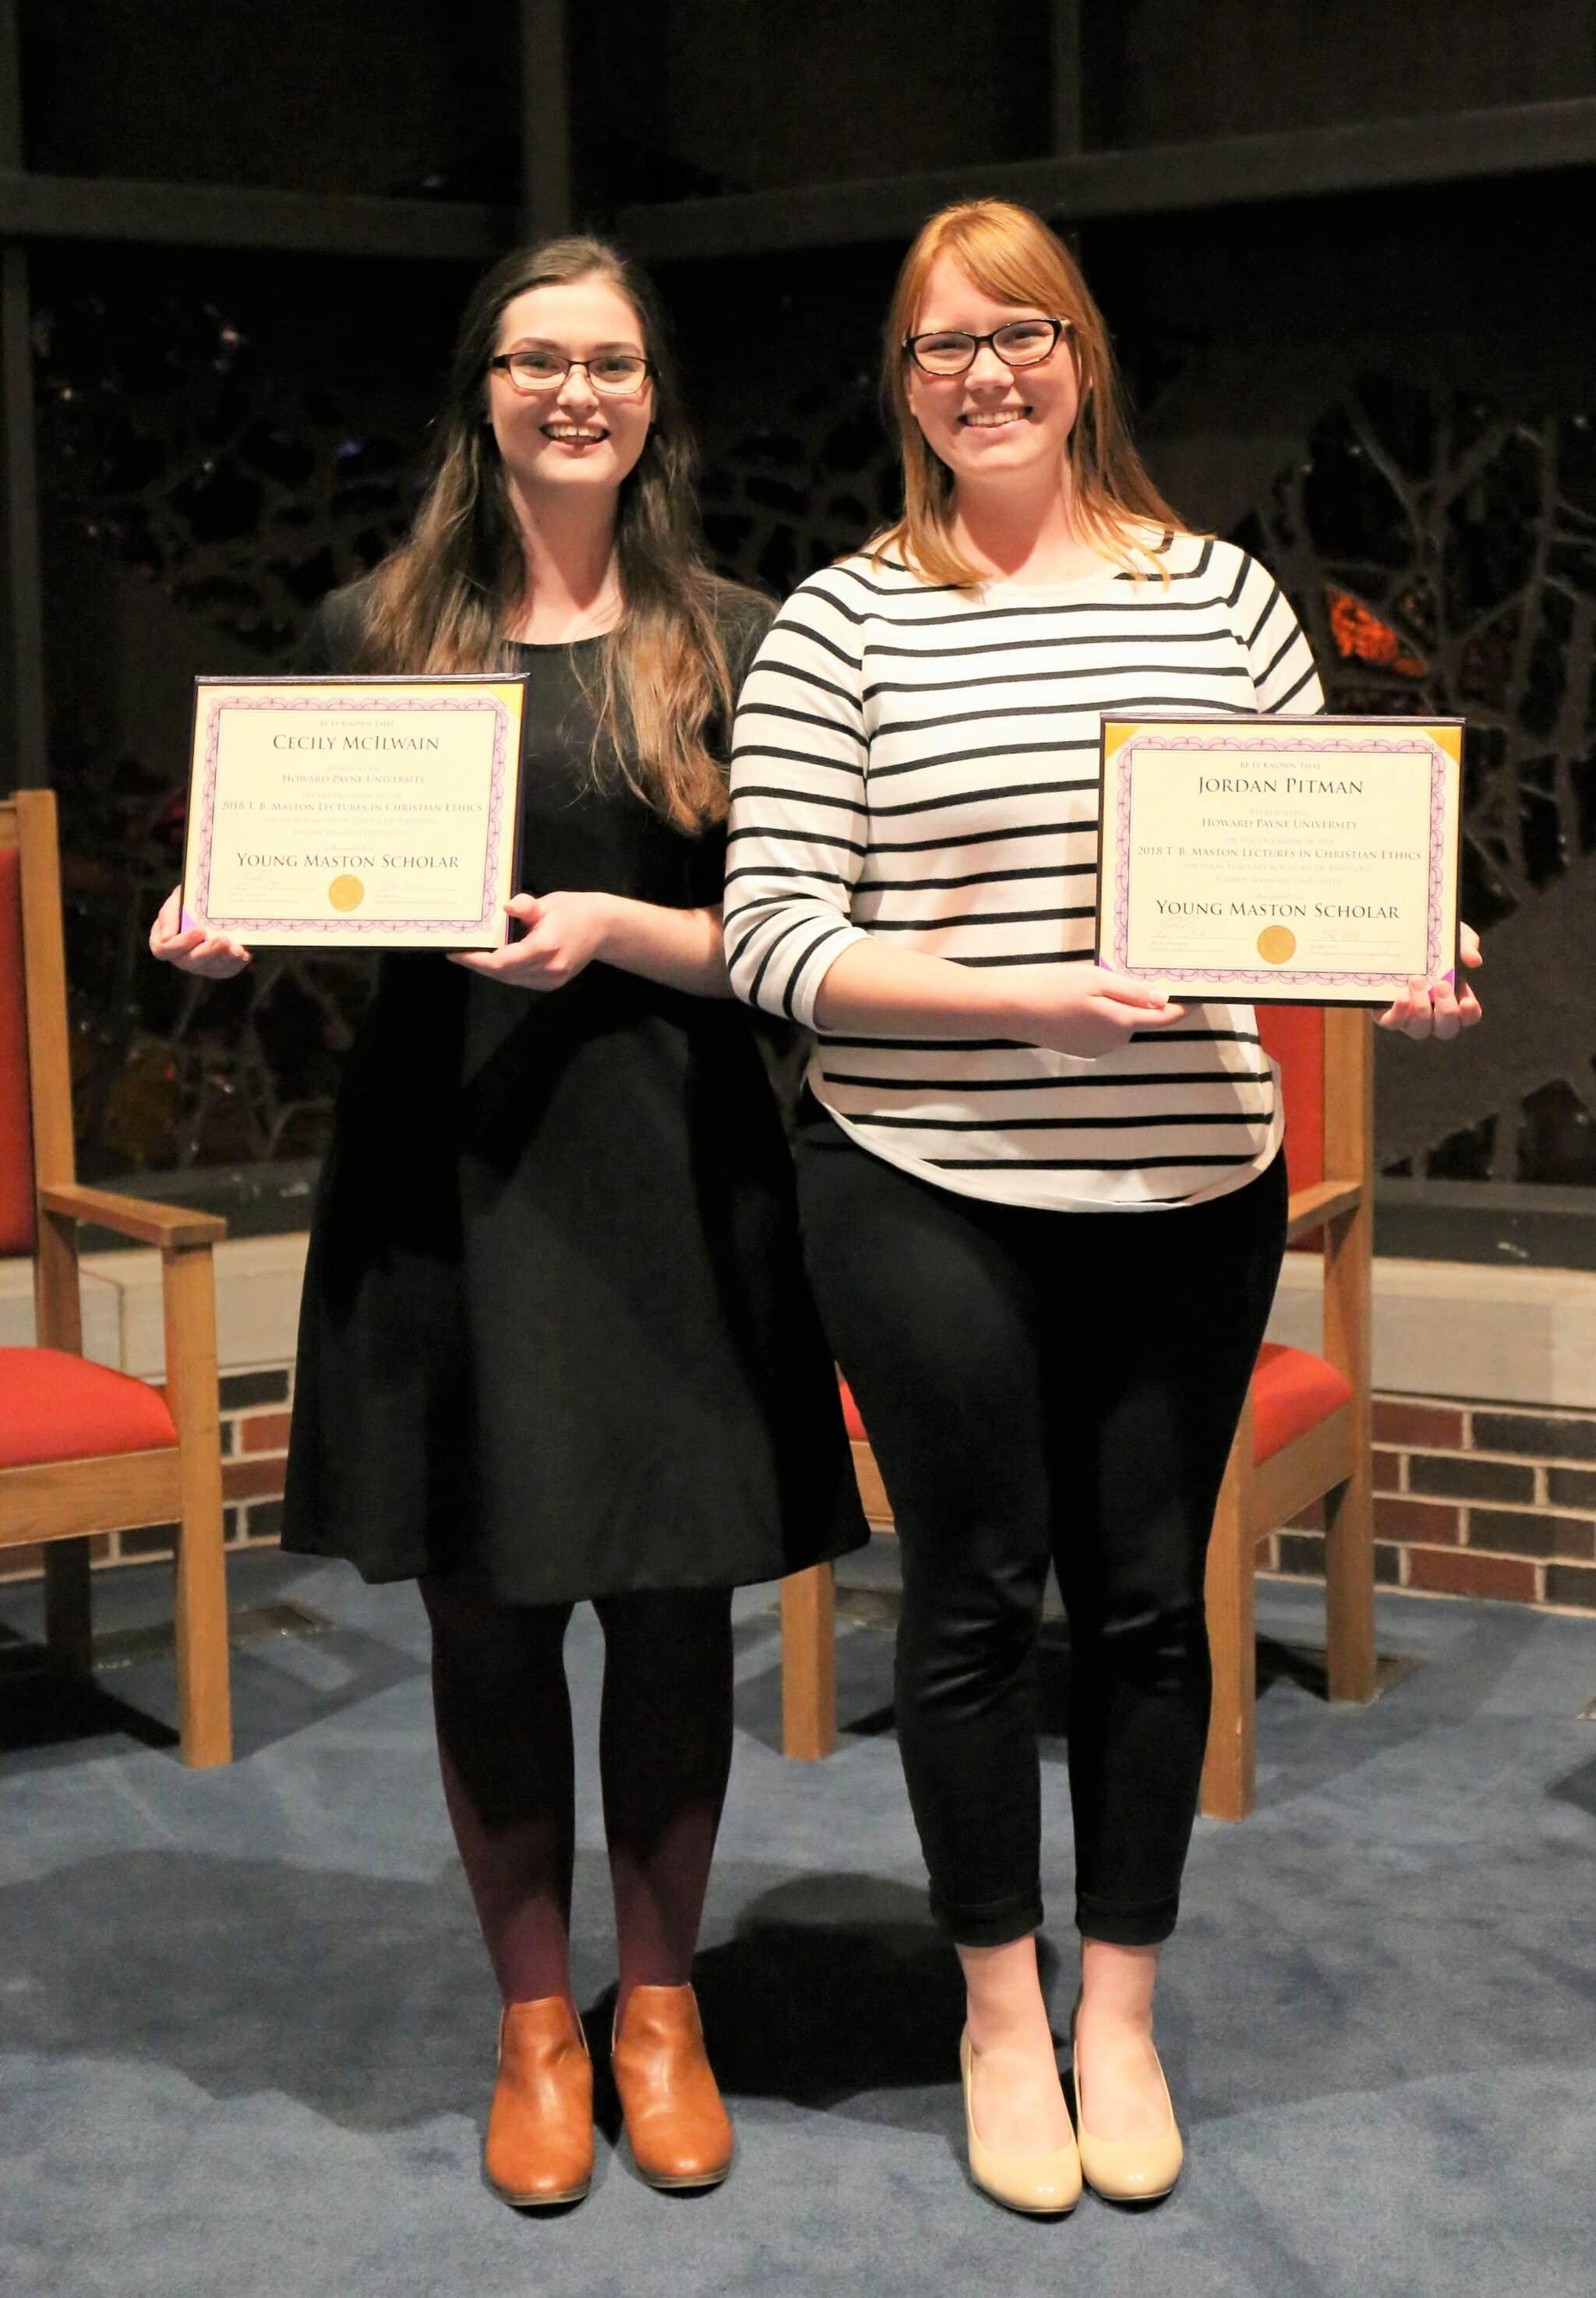 HPU 2018 Maston Scholars (McIlwain, Pitman)